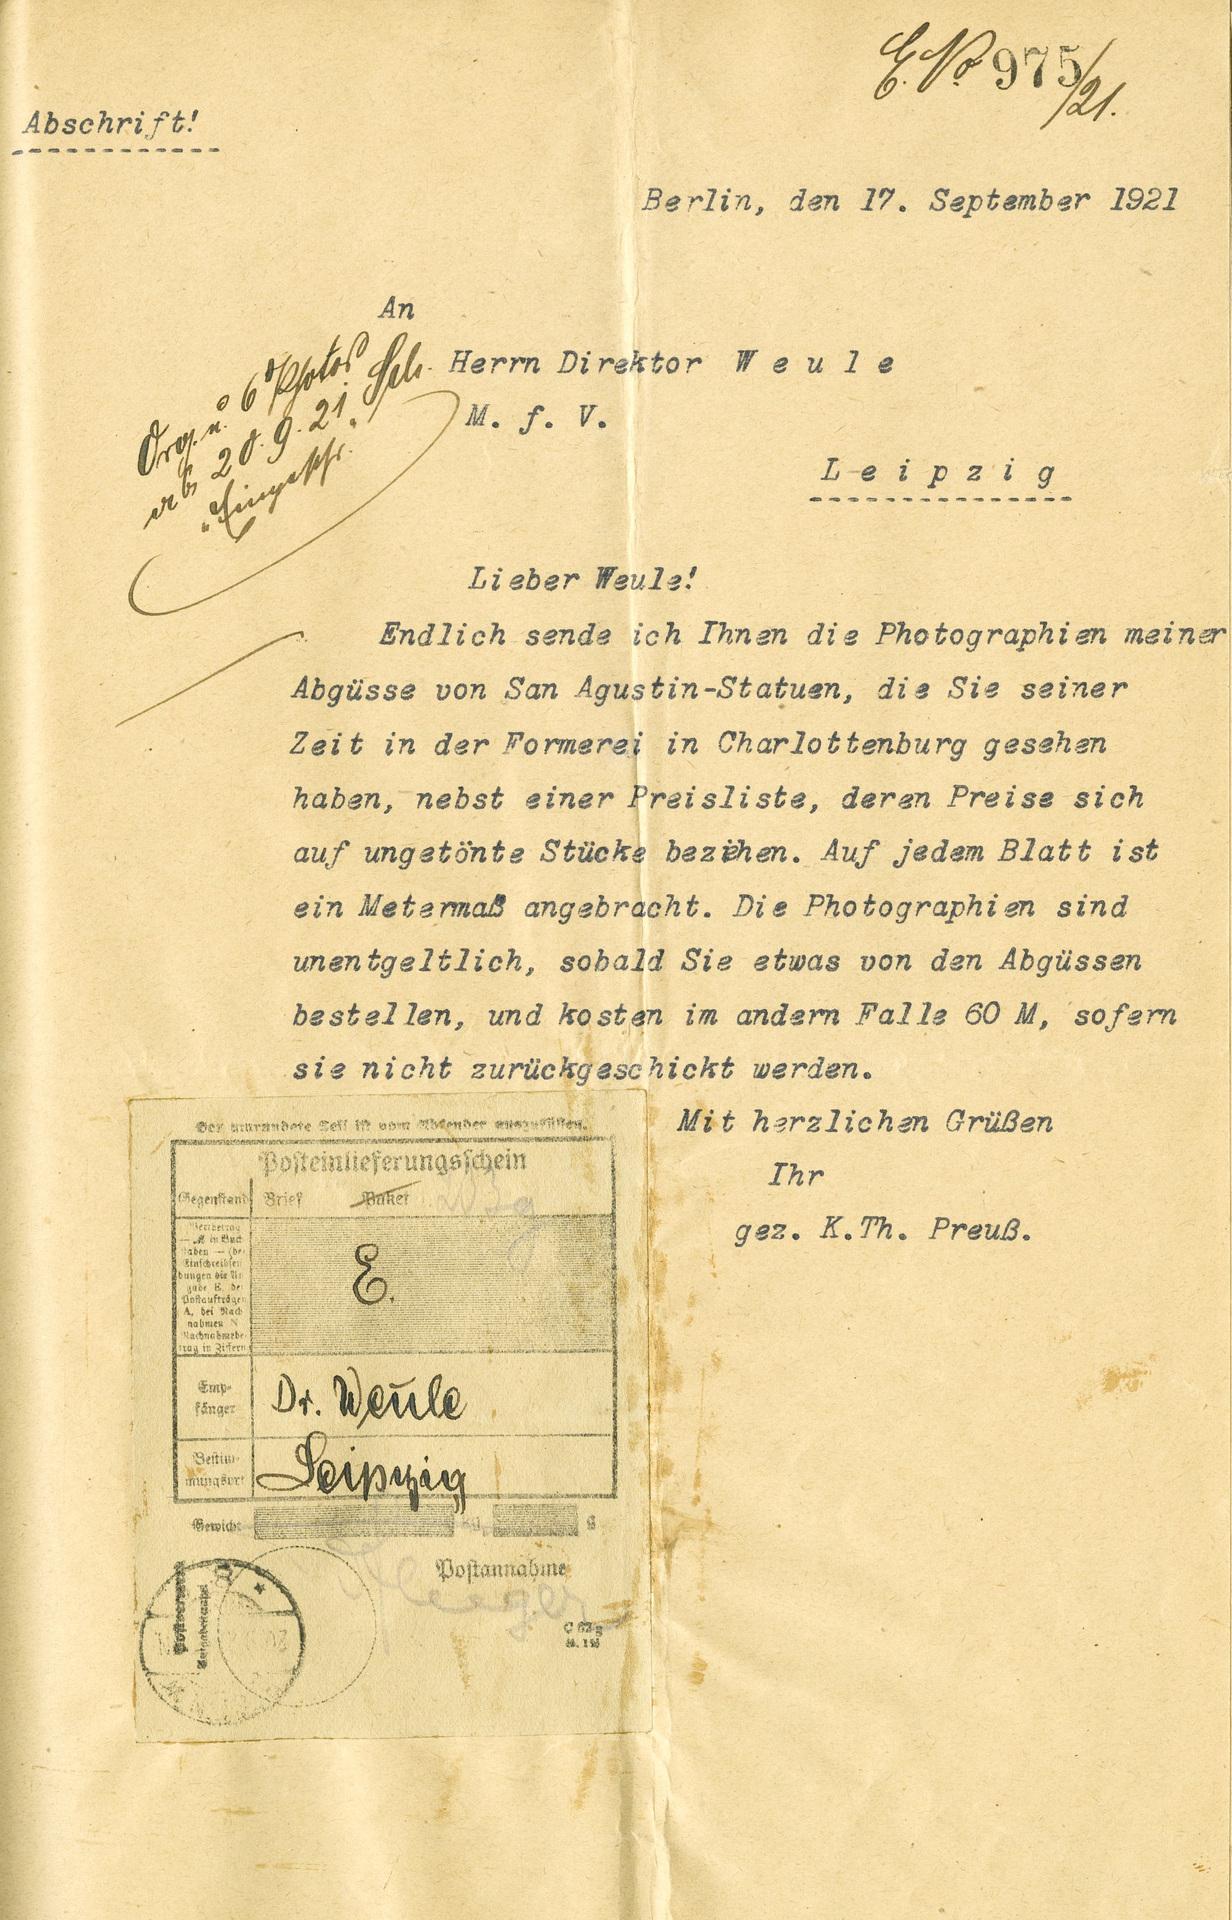 Korrespondenz Preuss an Karl Weule